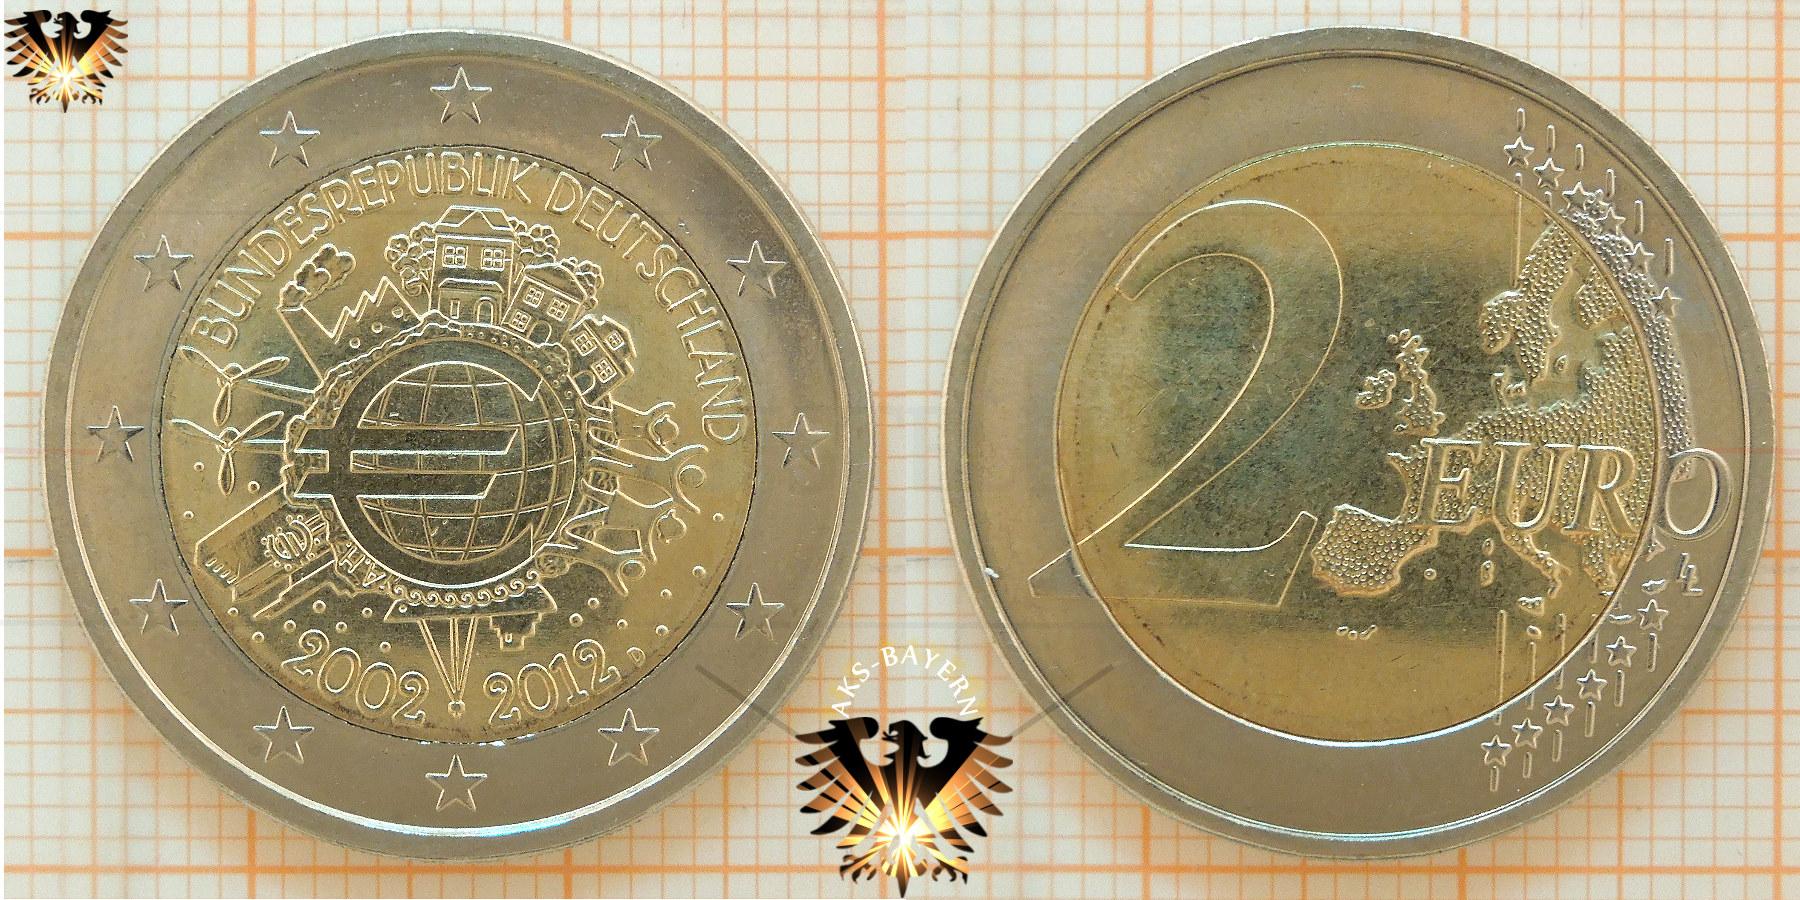 2 Brd 2012 A D F G J Gedenkmünze 10 Jahre Euro